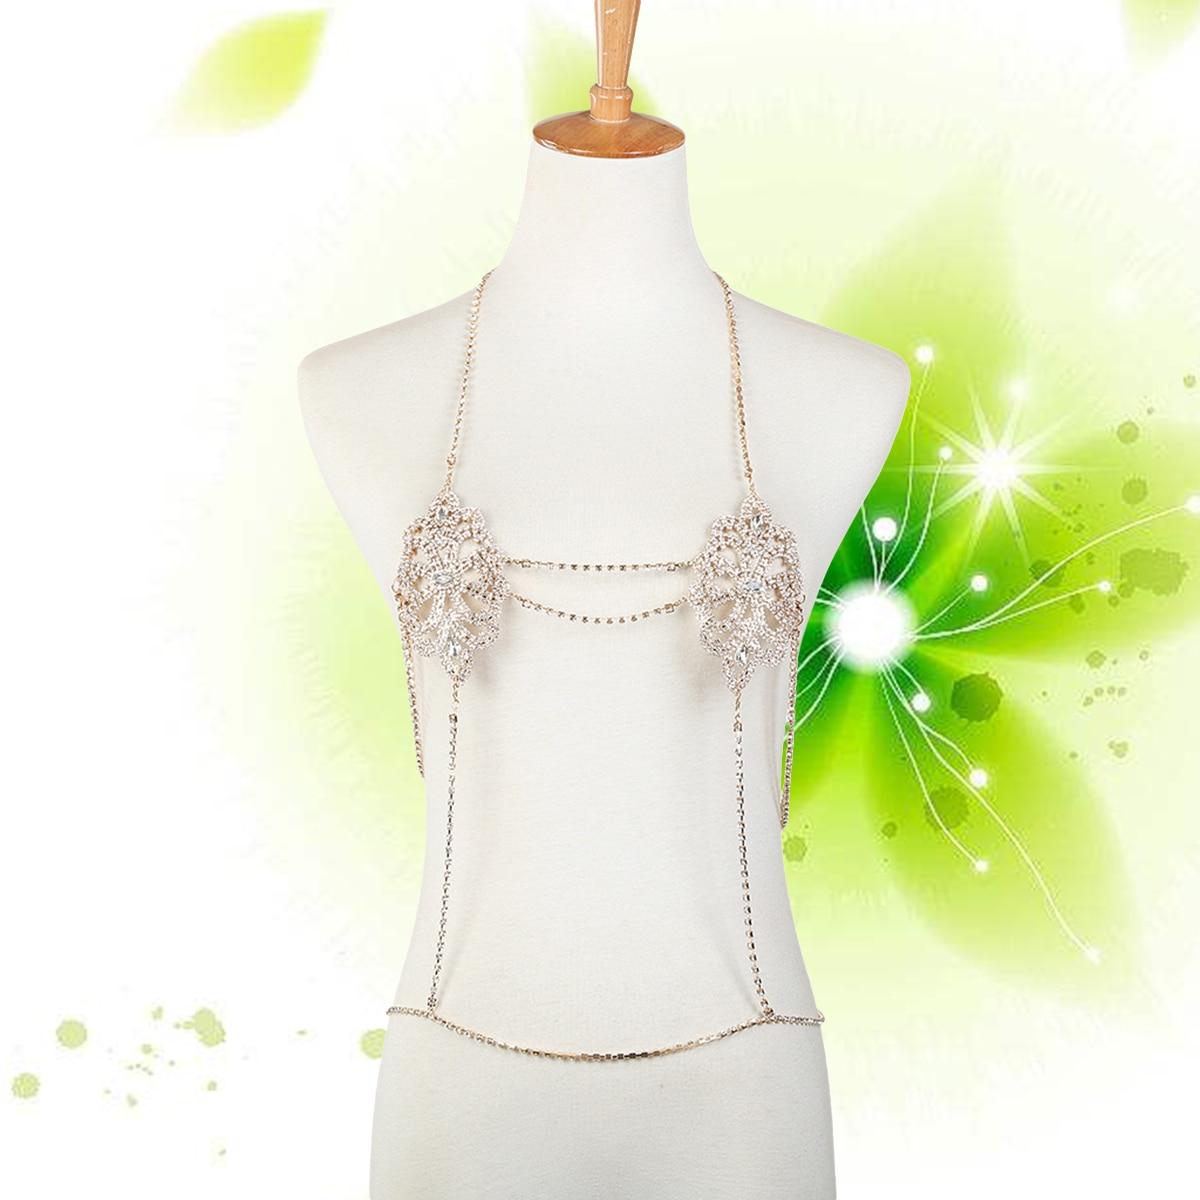 Womens Chest Chain Bikini Gold Body Chain Crossover Harness Alloy Tassel Jewelry